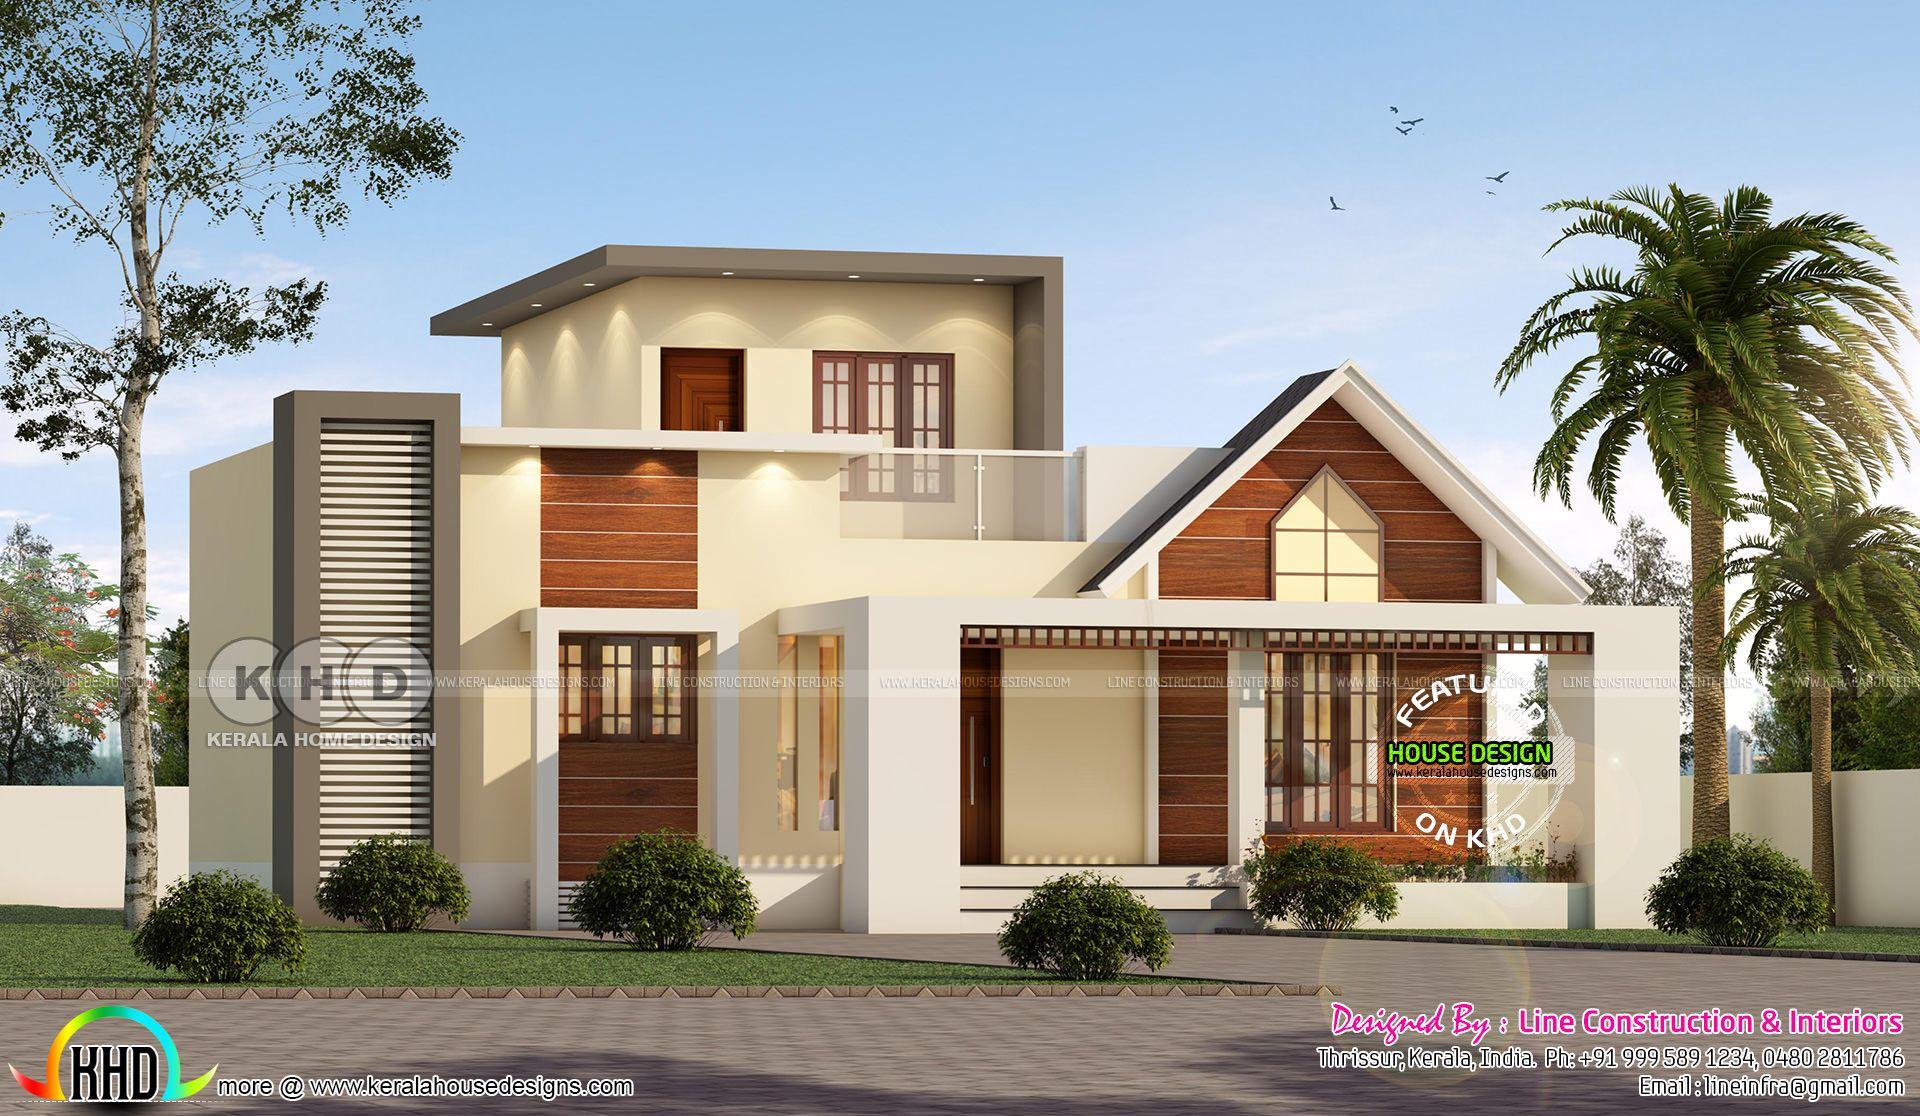 3 bedroom 1117 sqft home single storied in 2020 Kerala